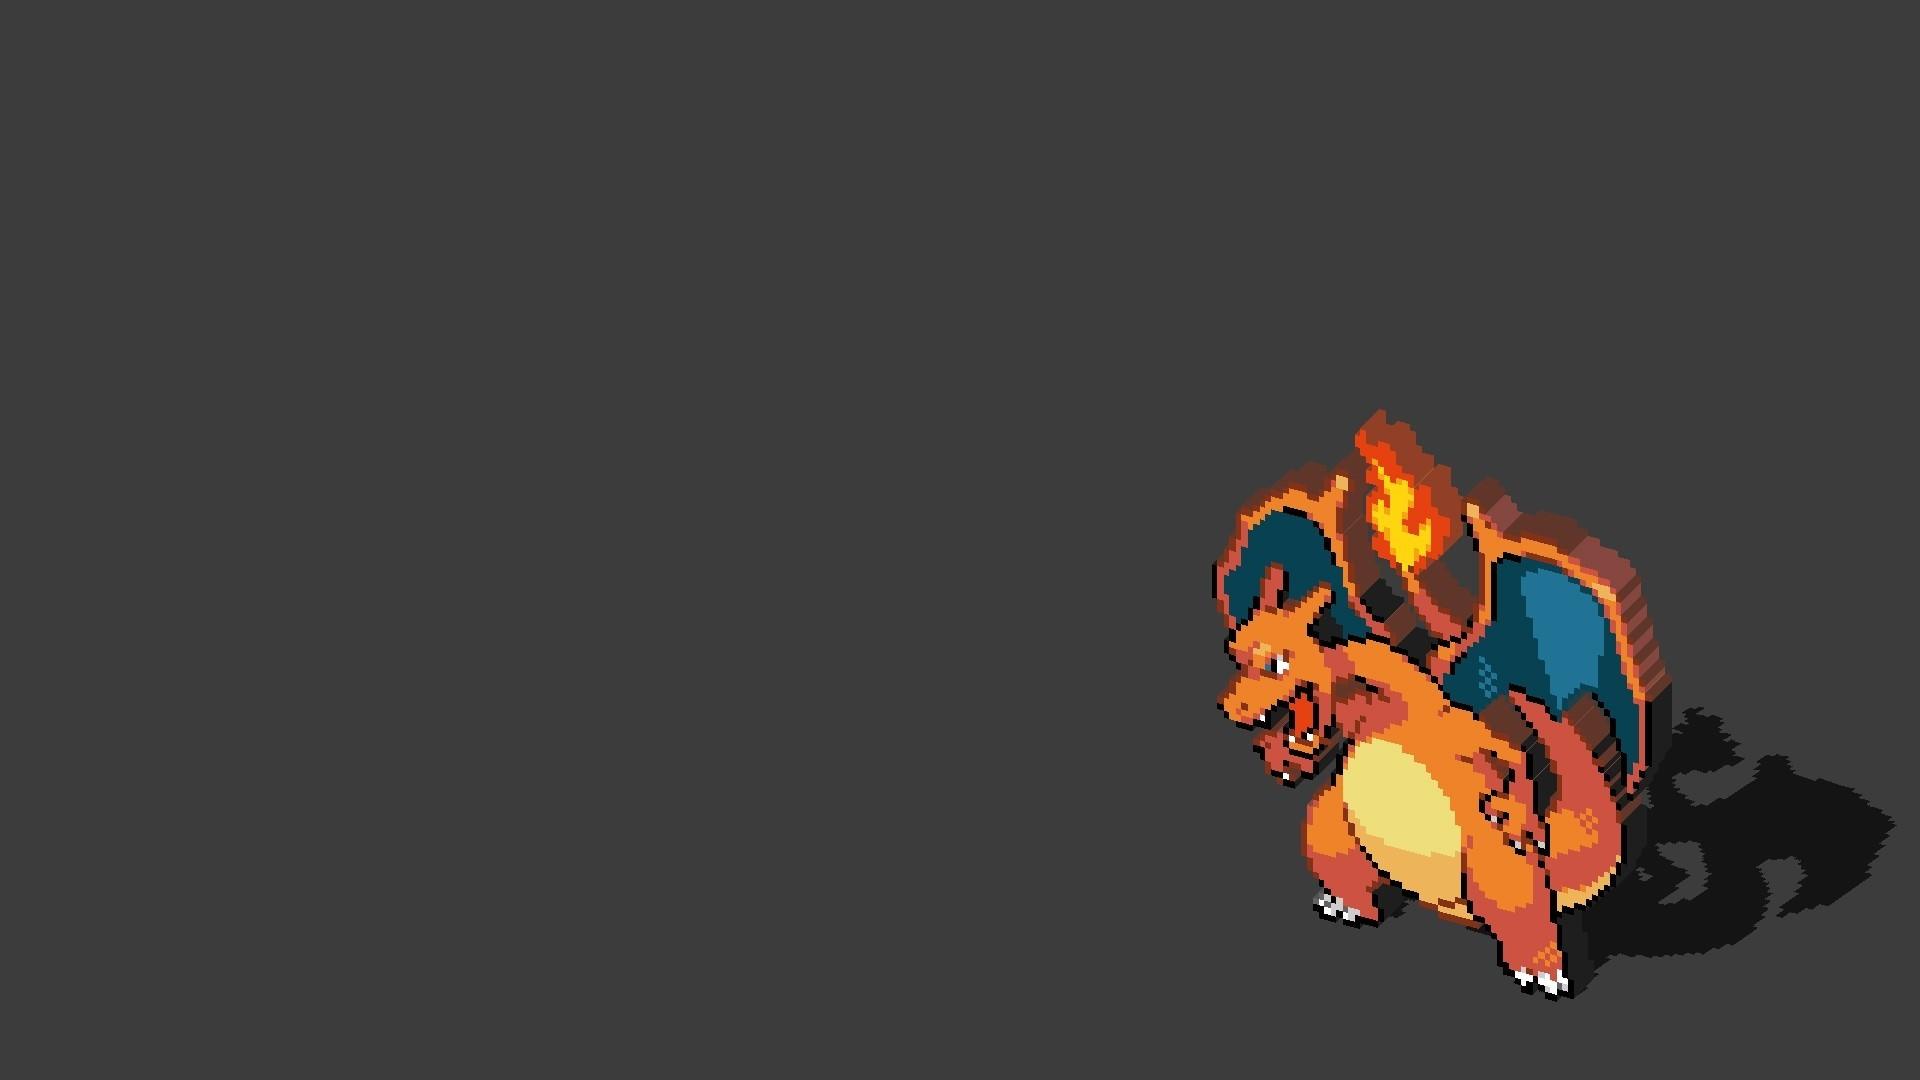 Pokemon Charizard wallpaper – 878080